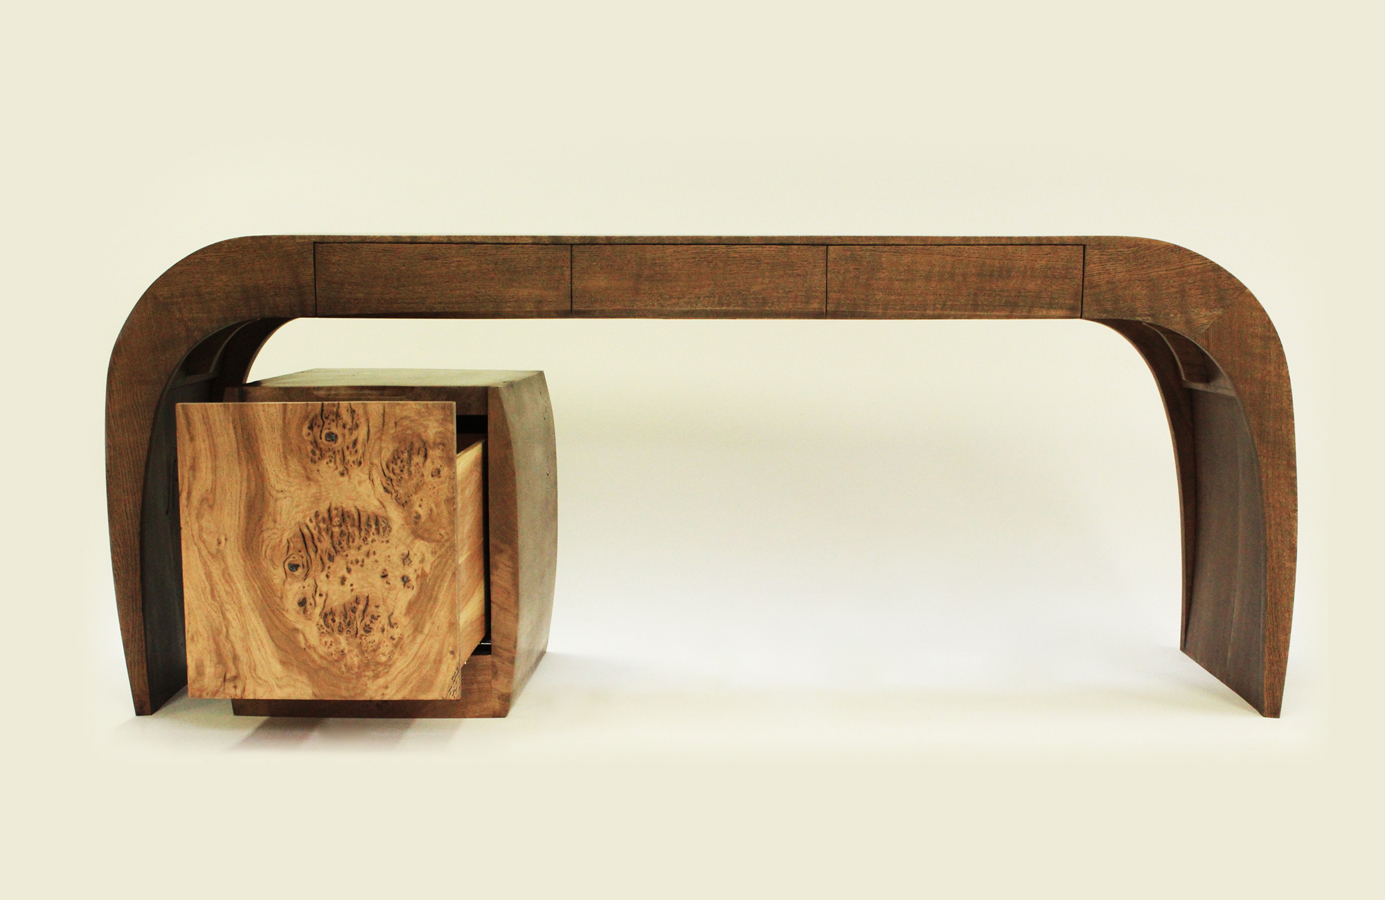 8Caliper-Desk-and-Chair_3.jpg